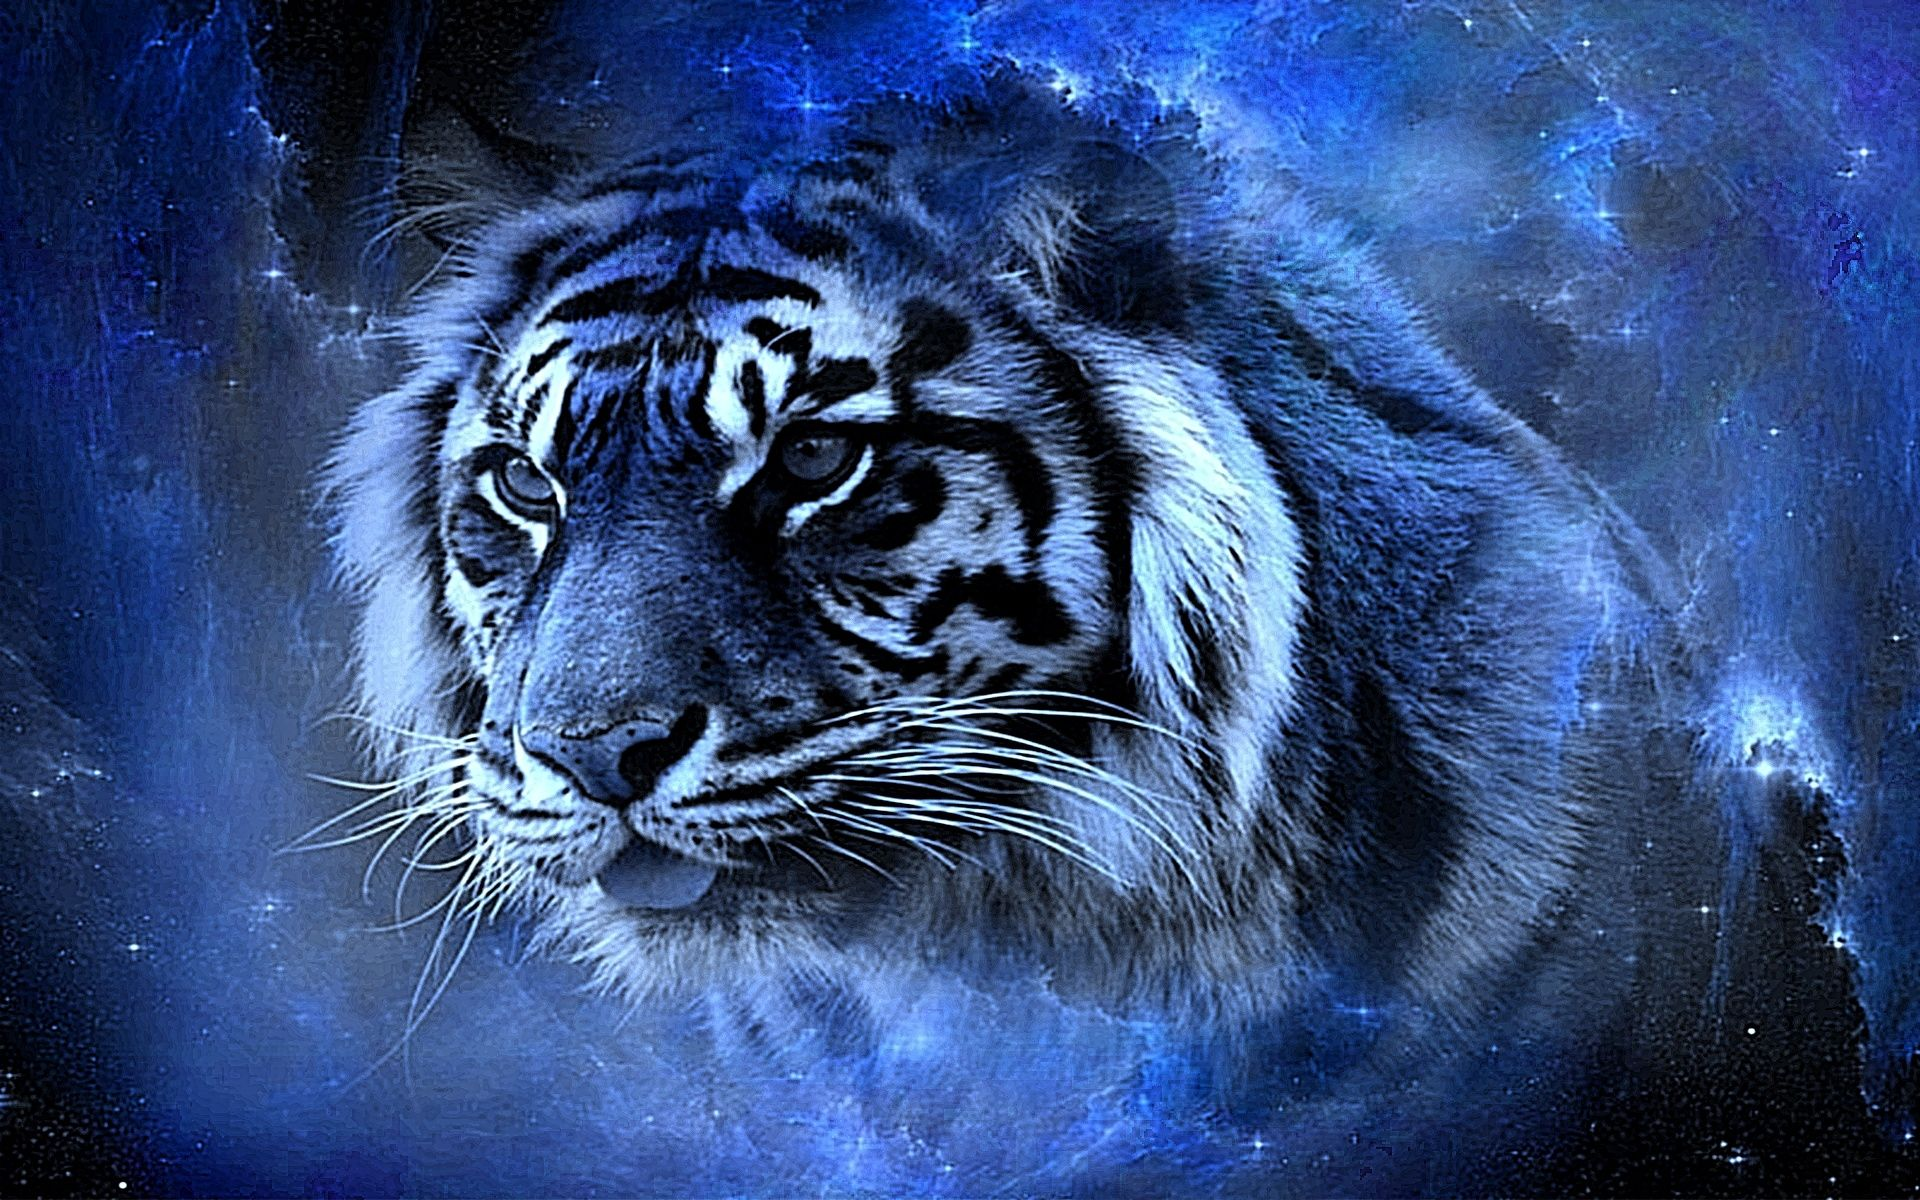 Tiger image 3d animals wallpapers pinterest tiger wallpaper tiger image 3d voltagebd Images